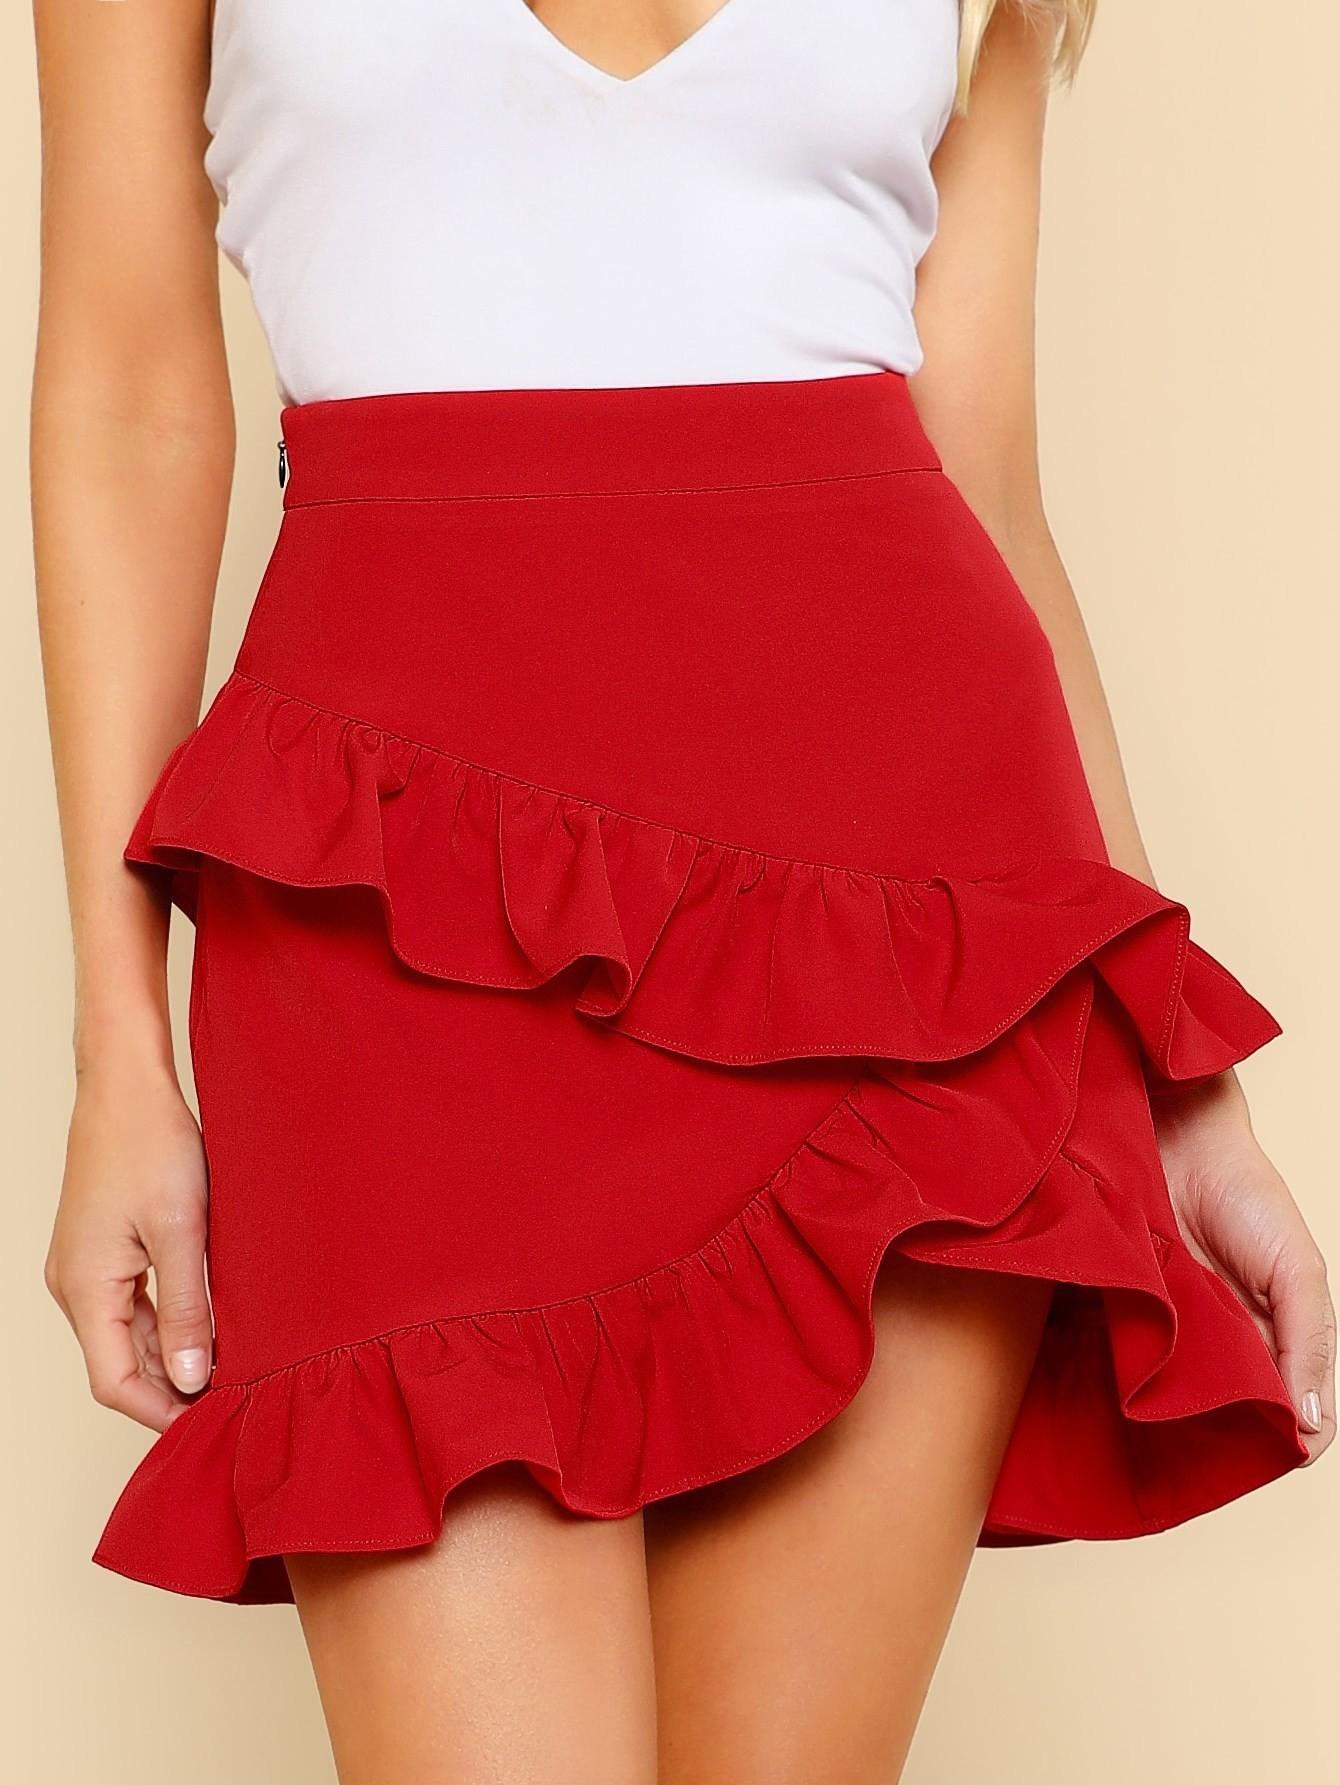 Купить Модная юбка с оборкой, Allie Leggett, SheIn